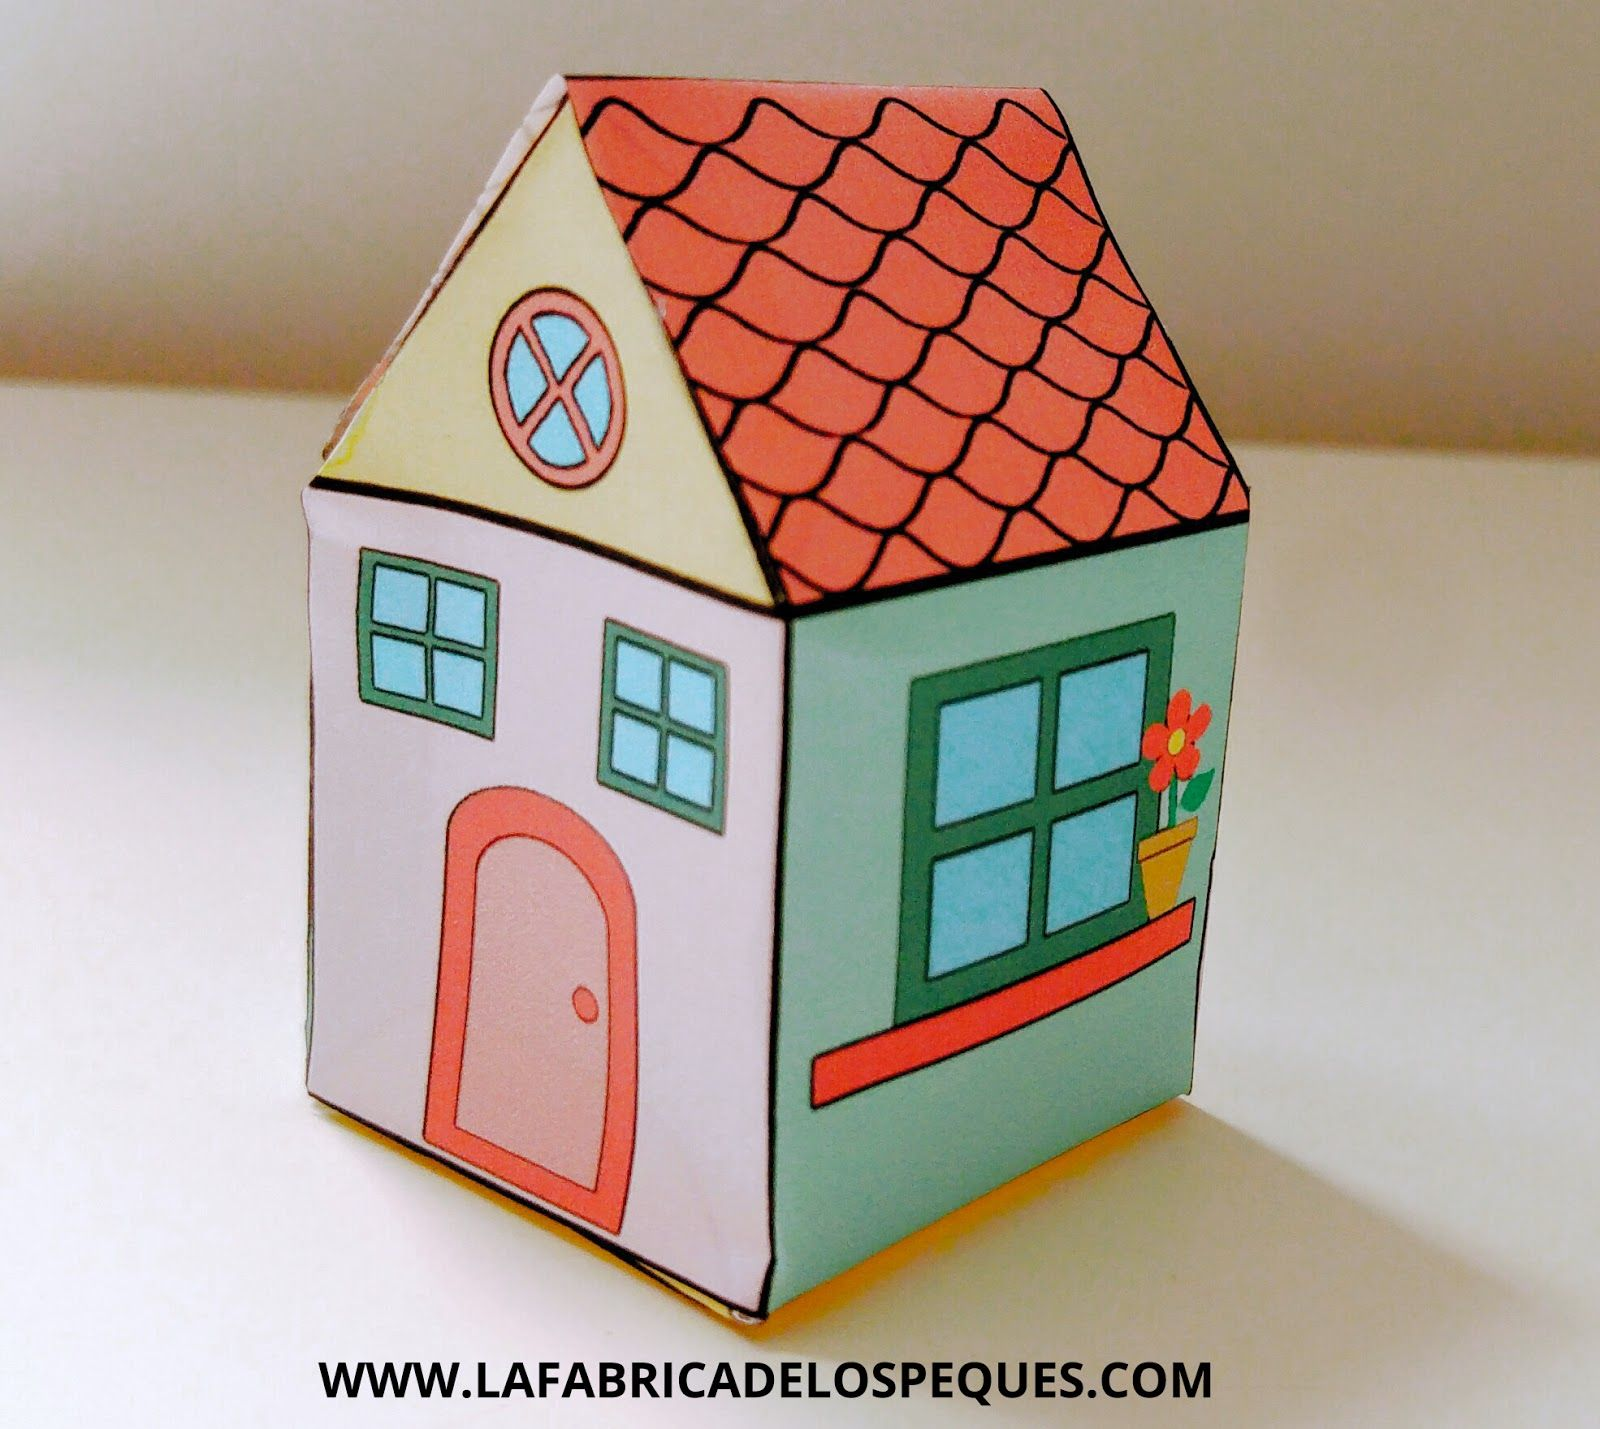 Manualidades infantiles: Casas imprimibles | Manualidades infantiles ...